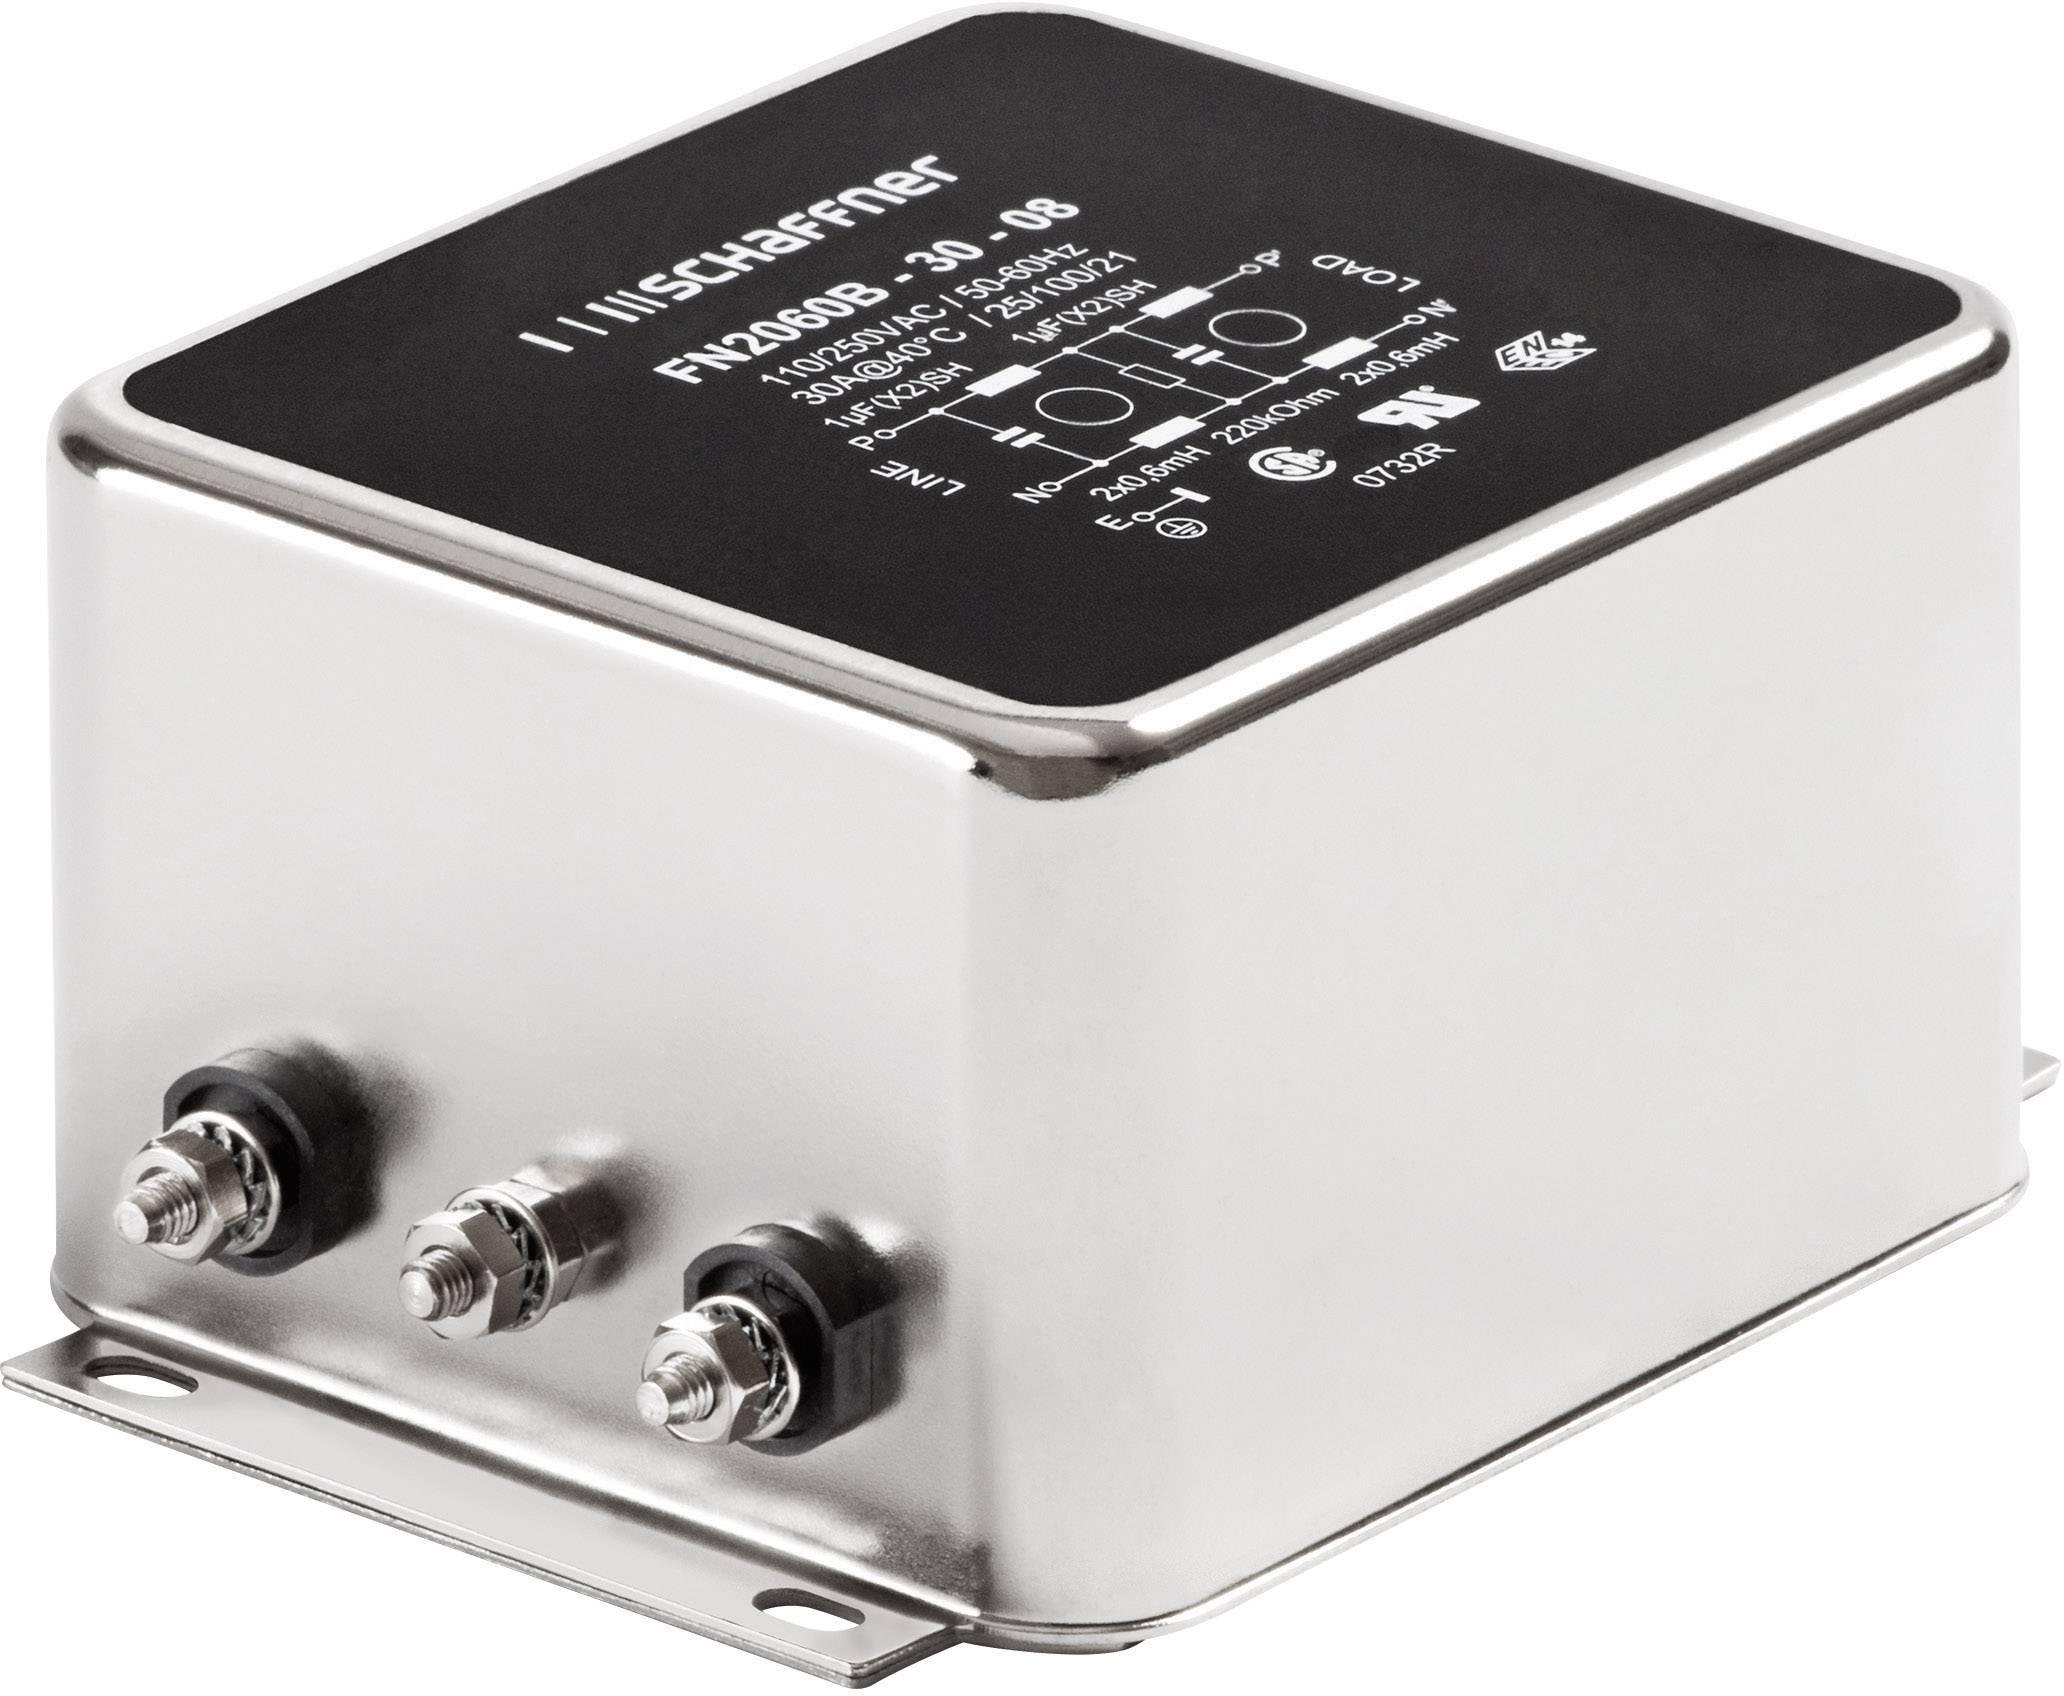 Odrušovací filter Schaffner FN 2060-6-06 FN 2060-6-06, 250 V/AC, 6 A, 0.97 mH, (š x v) 71 mm x 46.6 mm, 1 ks